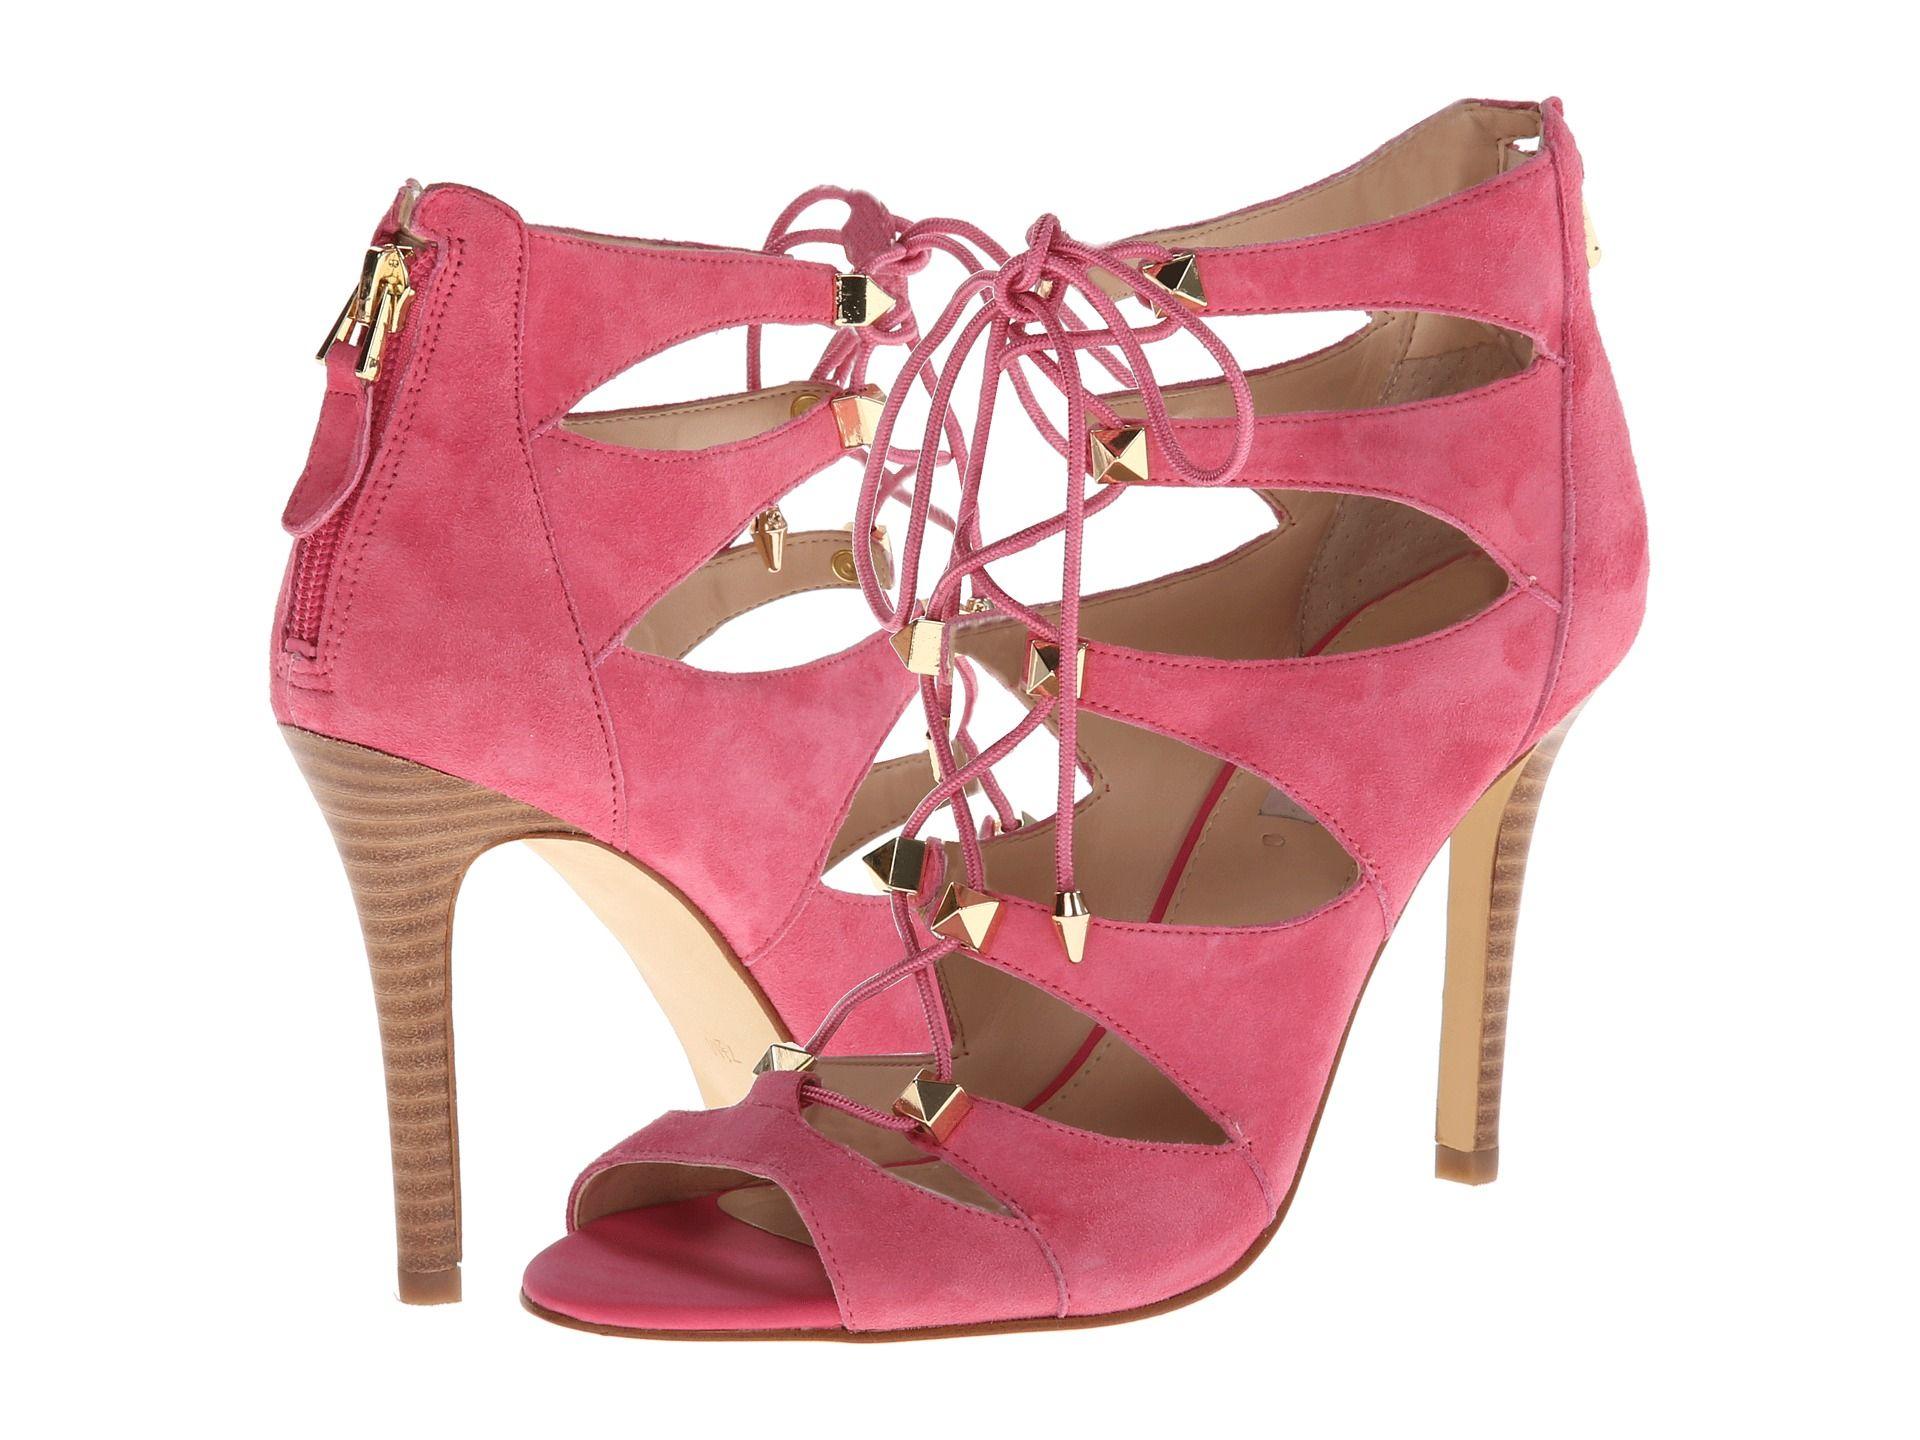 7978c3a72b99 GUESS Legari Pink Suede - Zappos.com Free Shipping BOTH Ways  110.00 ...